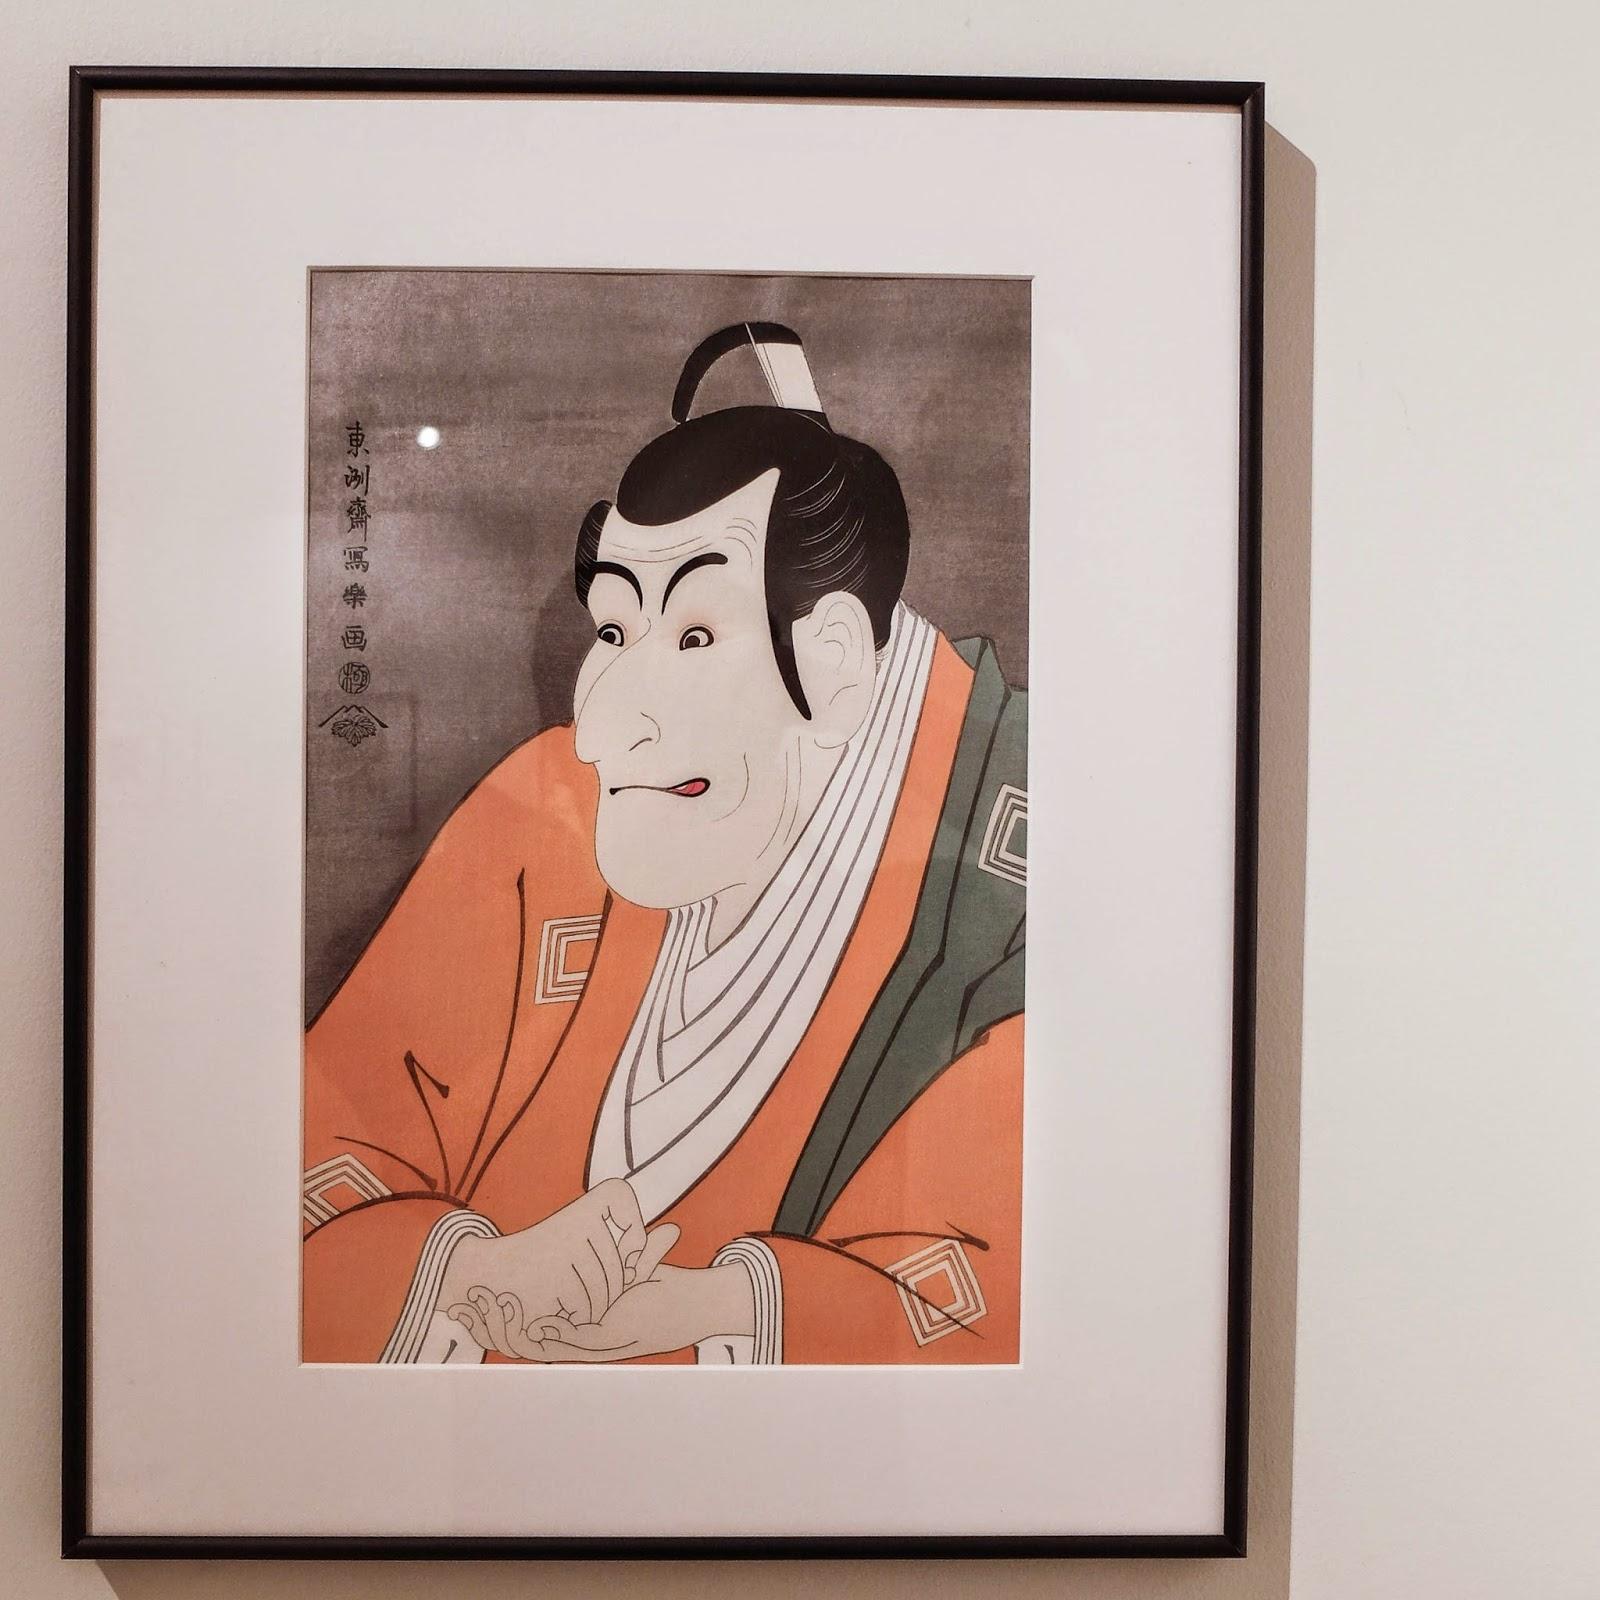 Ukiyoe Portraits exhibit - Ichikawa Ebizo by Sharaku Toshusai